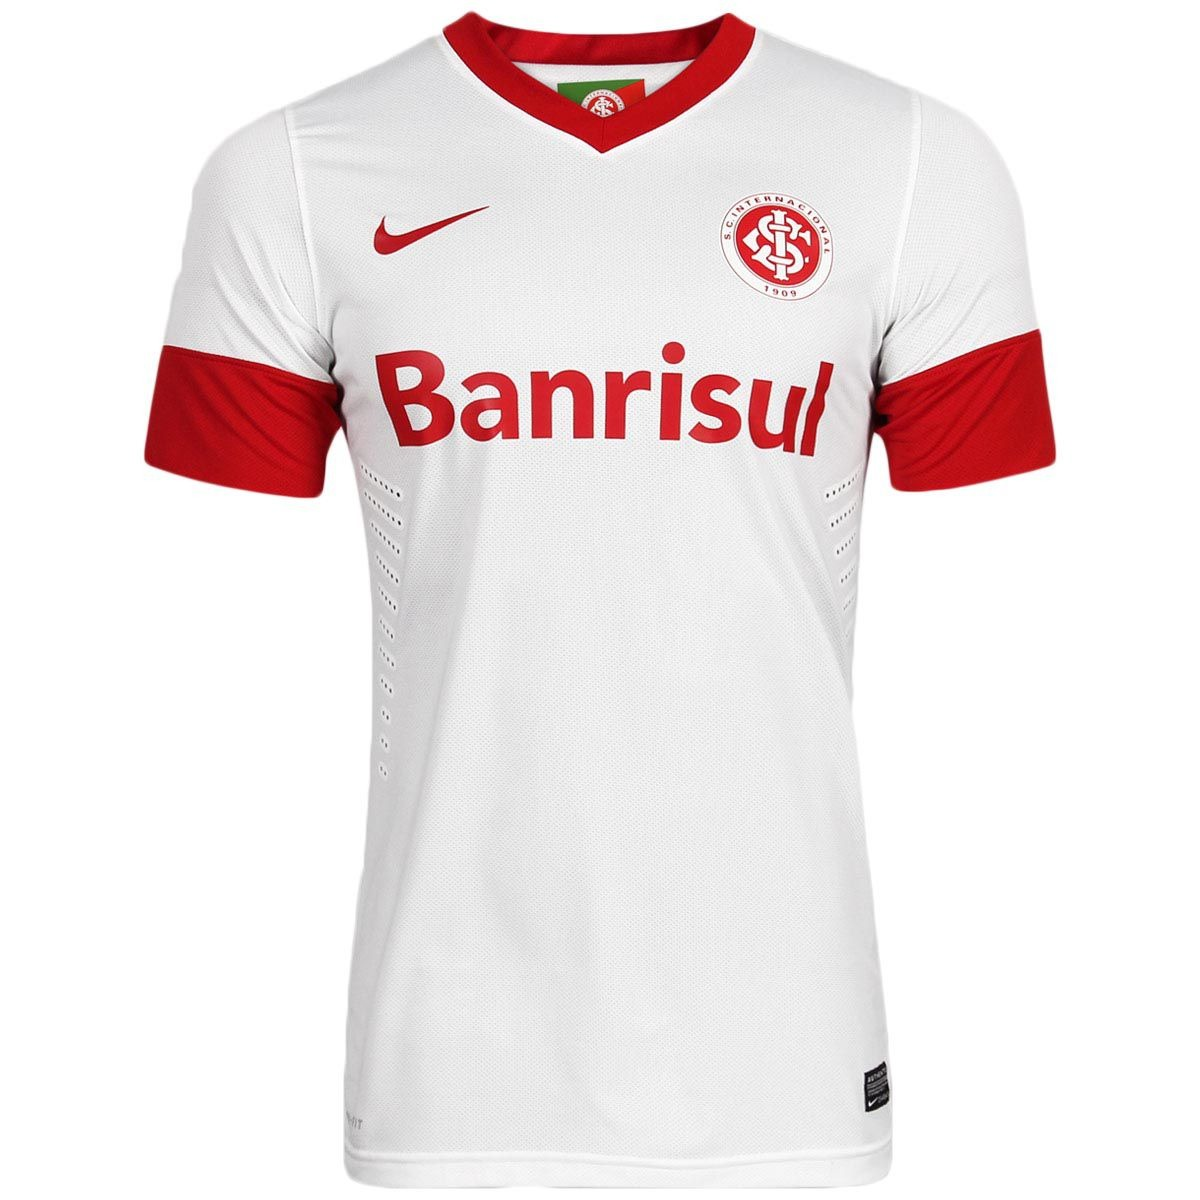 2358ed5aadf8a Camisa Nike Internacional 2 12 13 S nº Jogador De 249